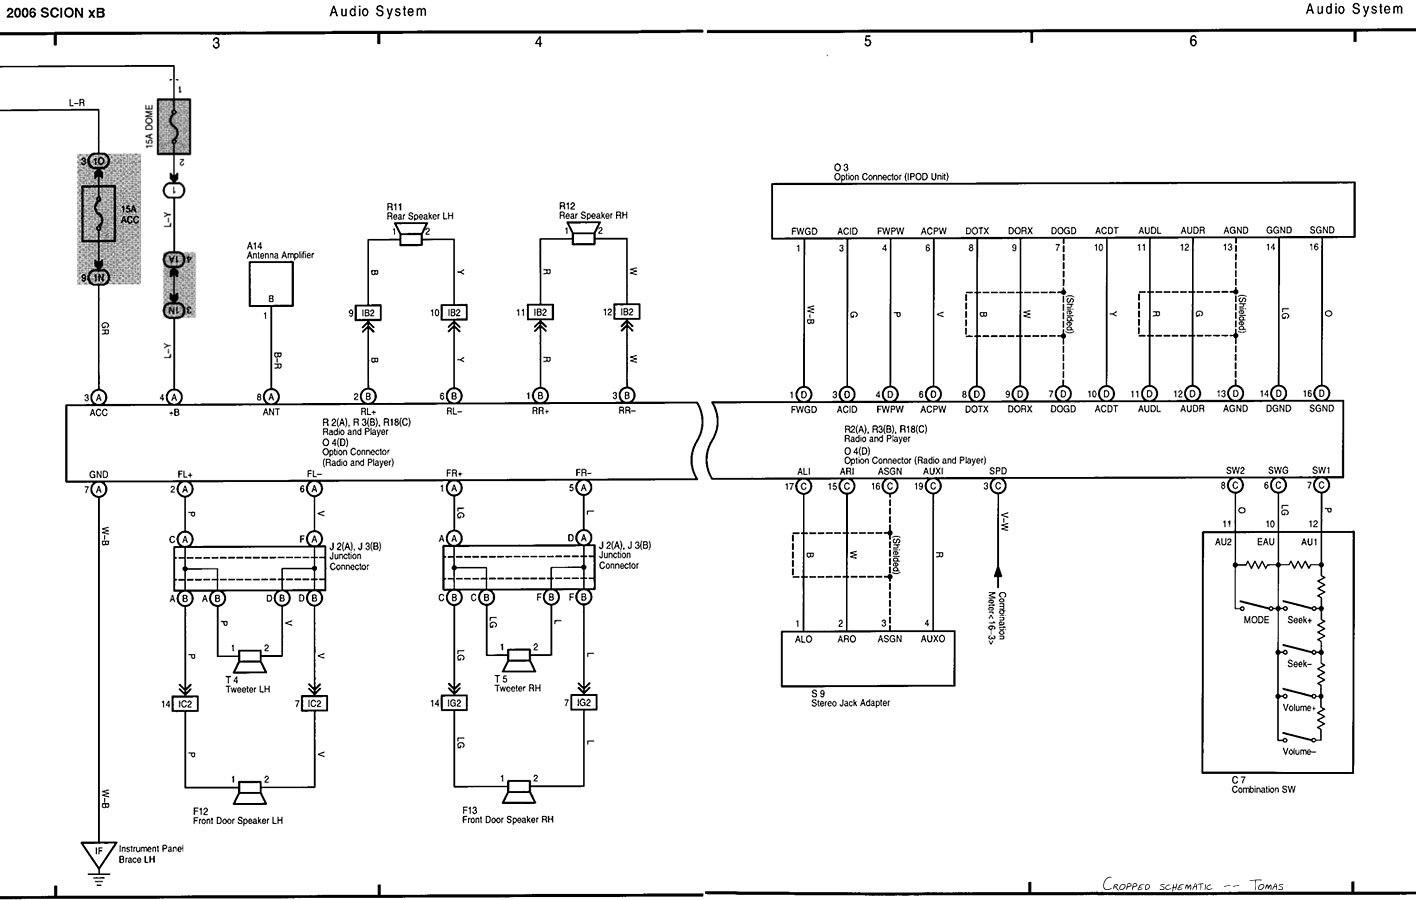 tc 2012 scion pt546 wiring diagram bs 1586  2007 scion tc stereo wiring diagram wiring diagram  2007 scion tc stereo wiring diagram